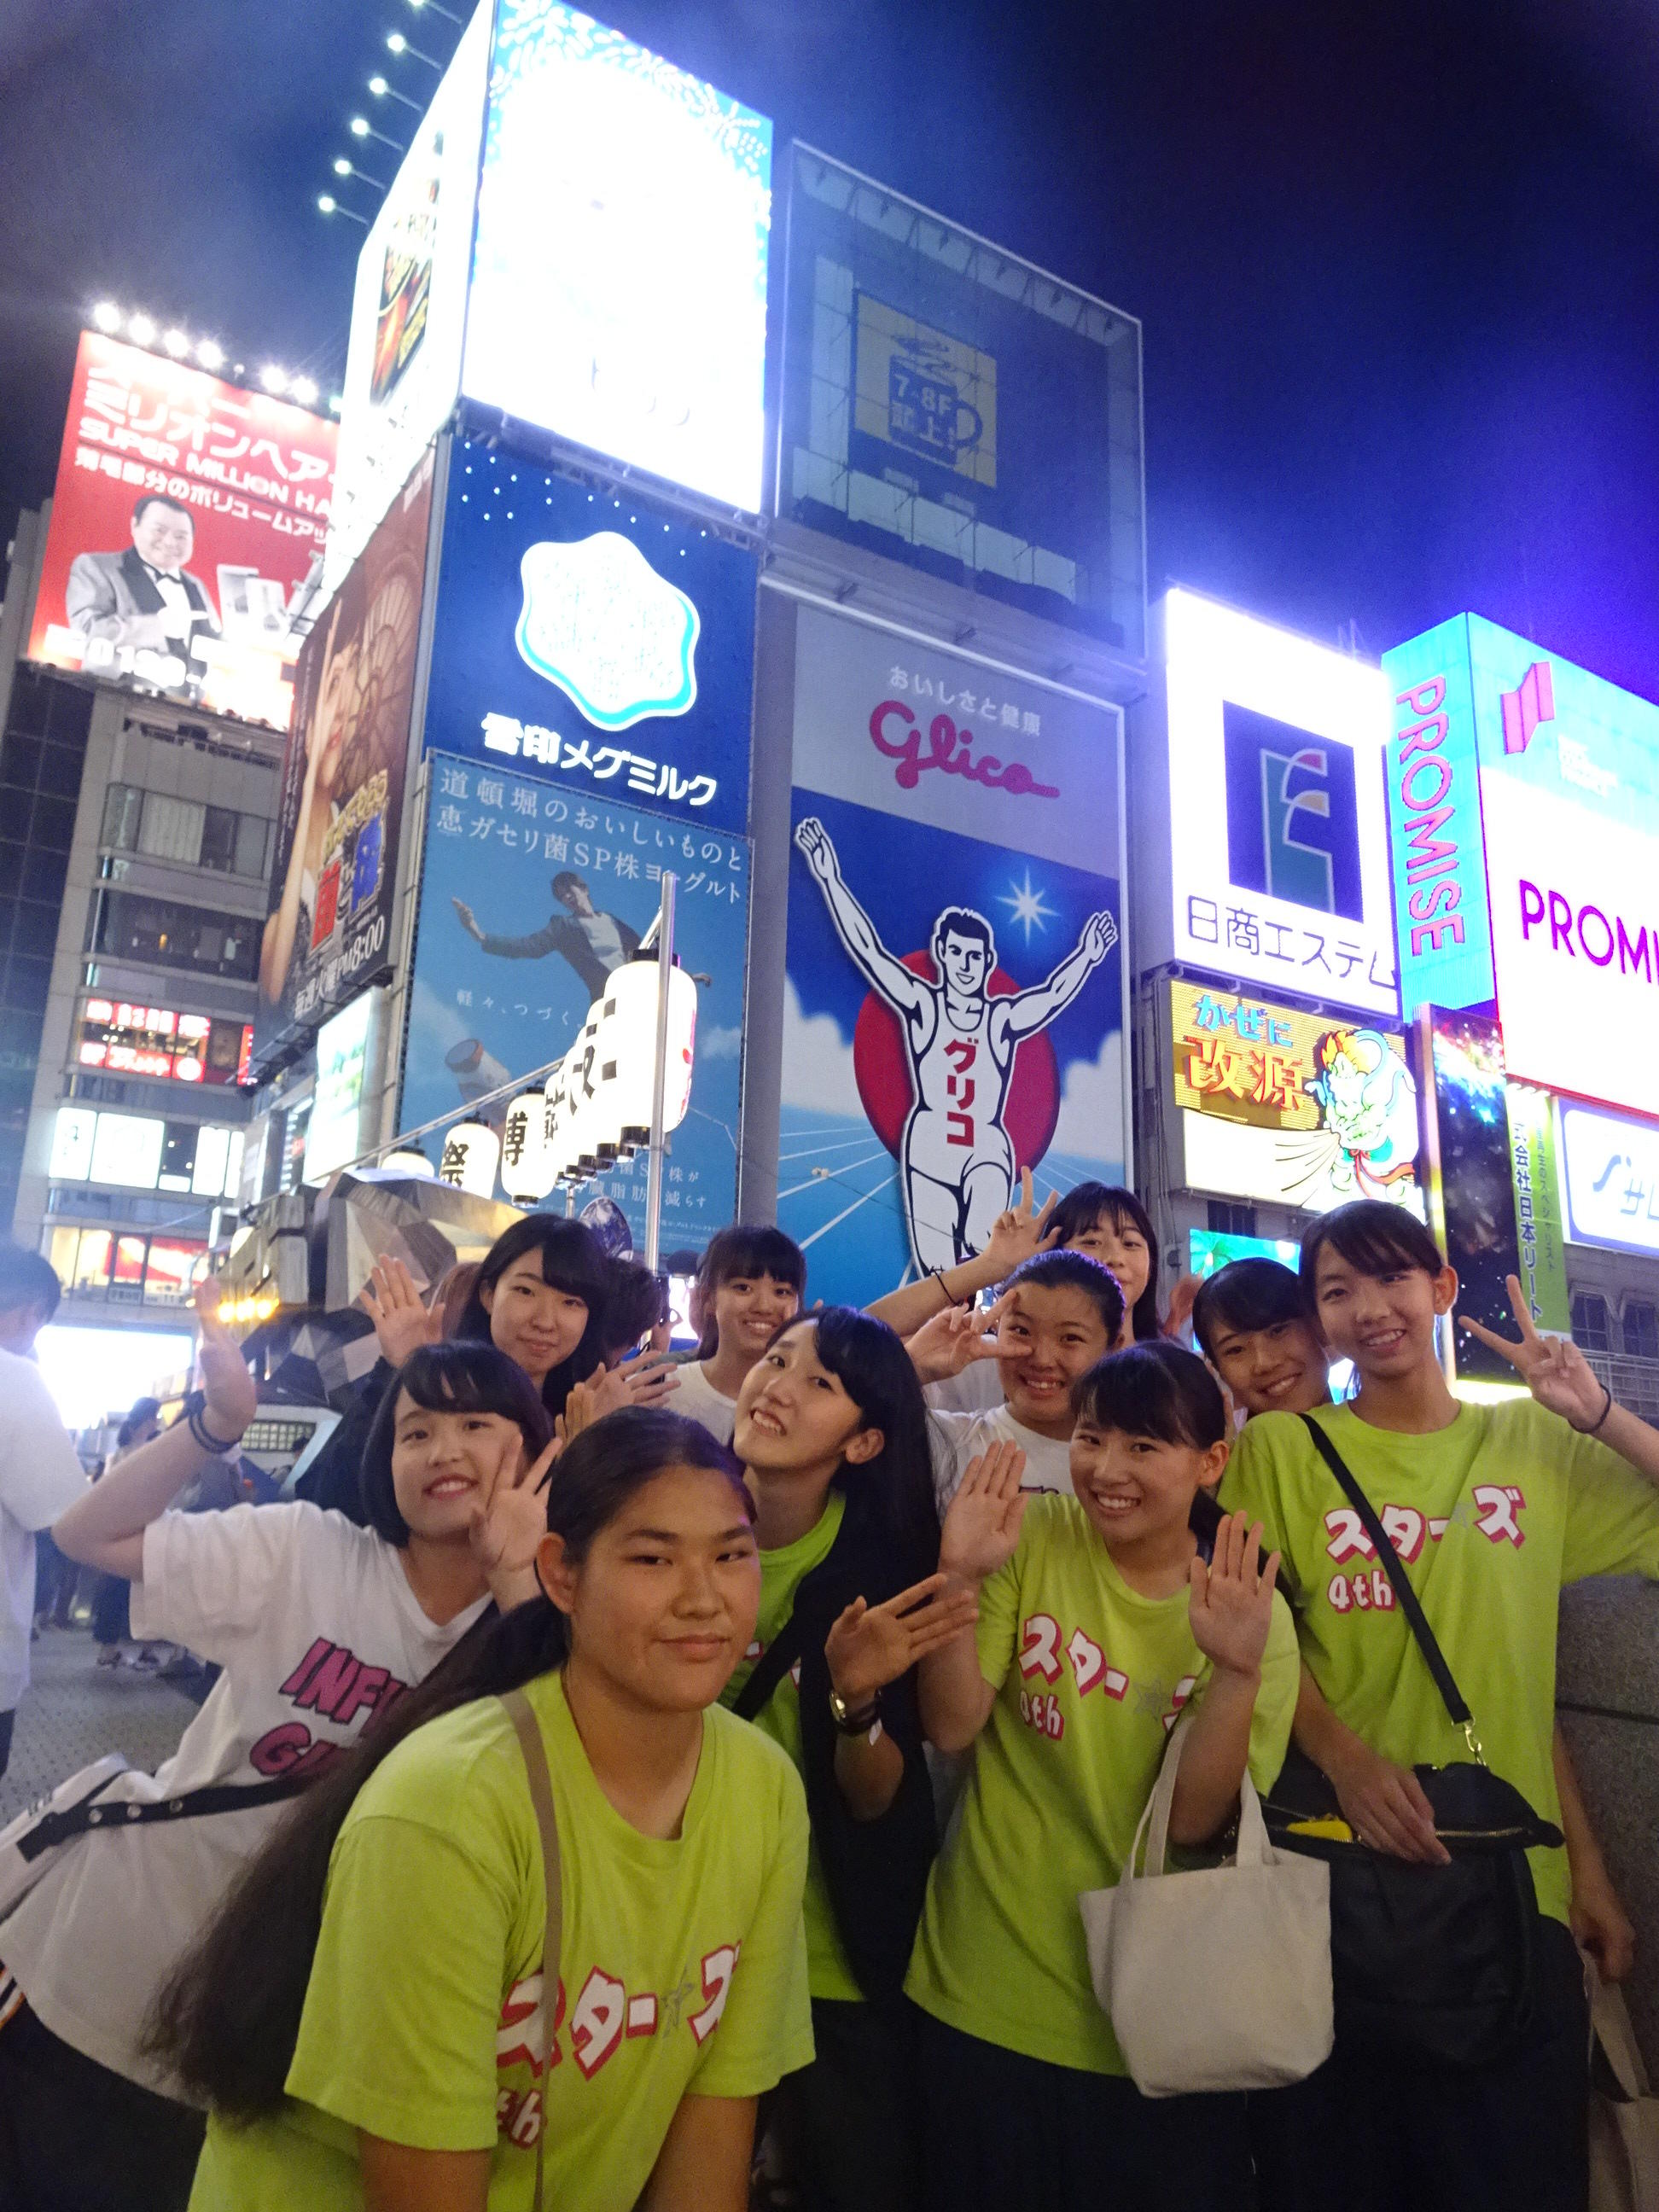 180801 In Osaka 1st (105).JPG